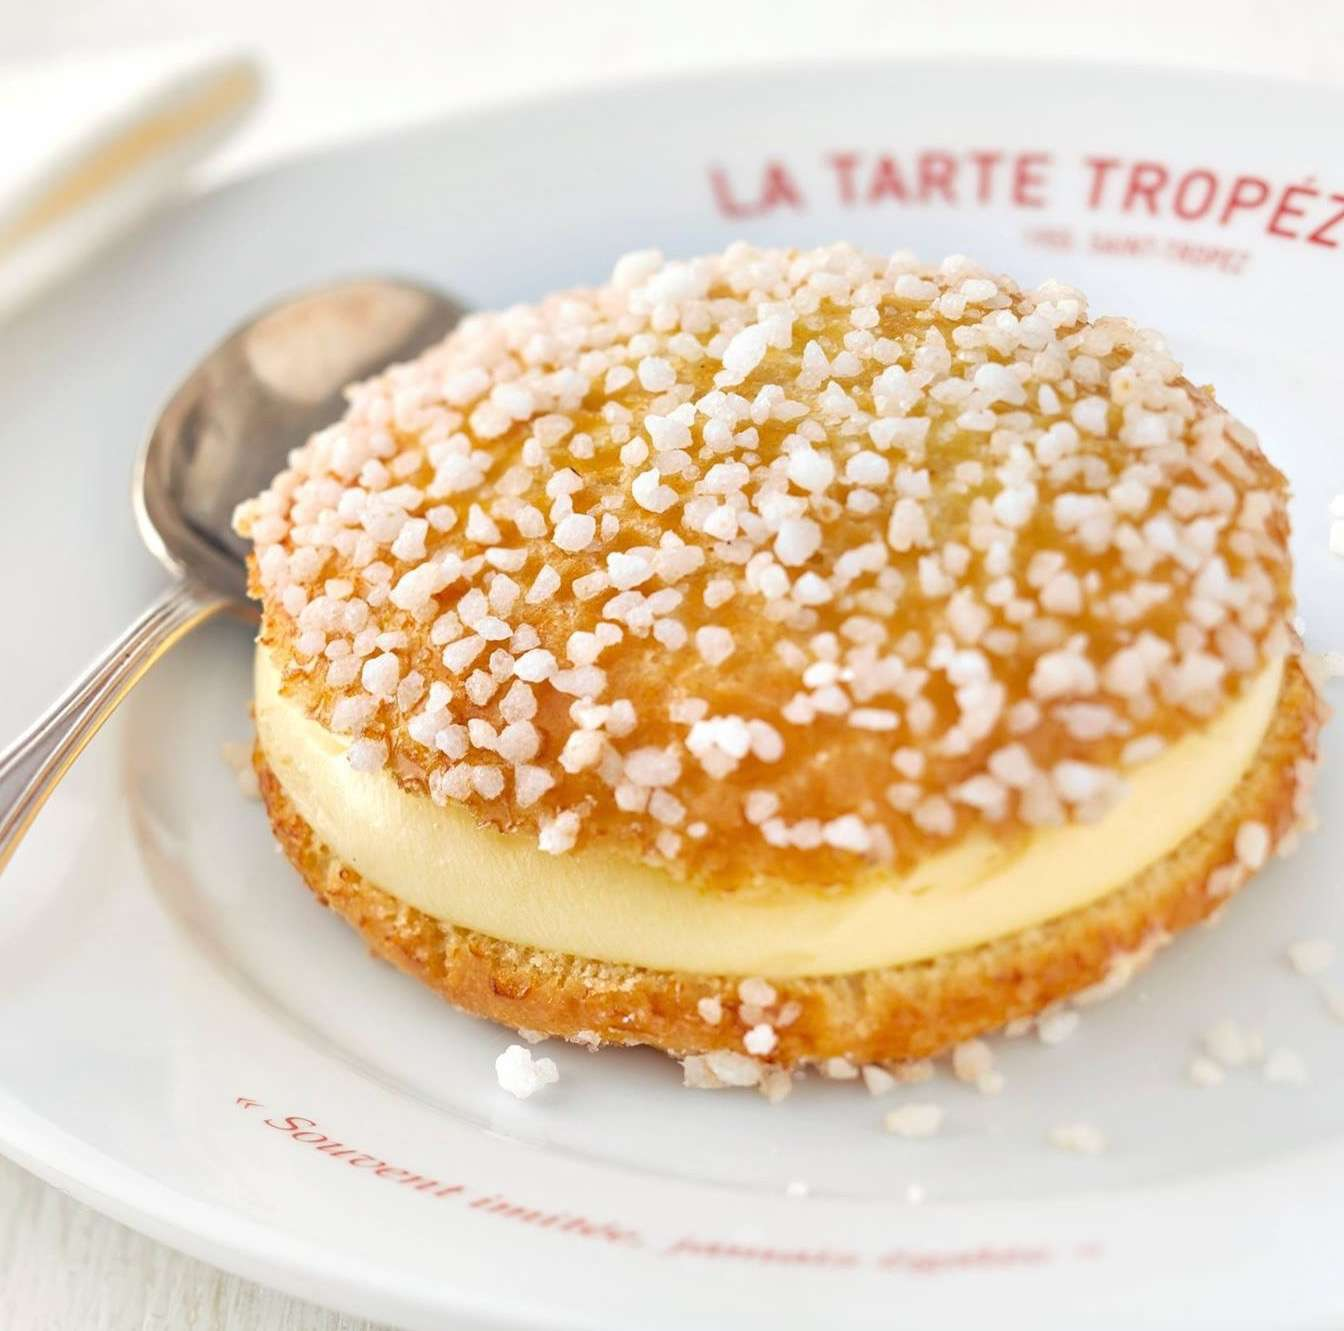 La Tarte Tropezienne, a cream-filled cake native to St-Tropez.